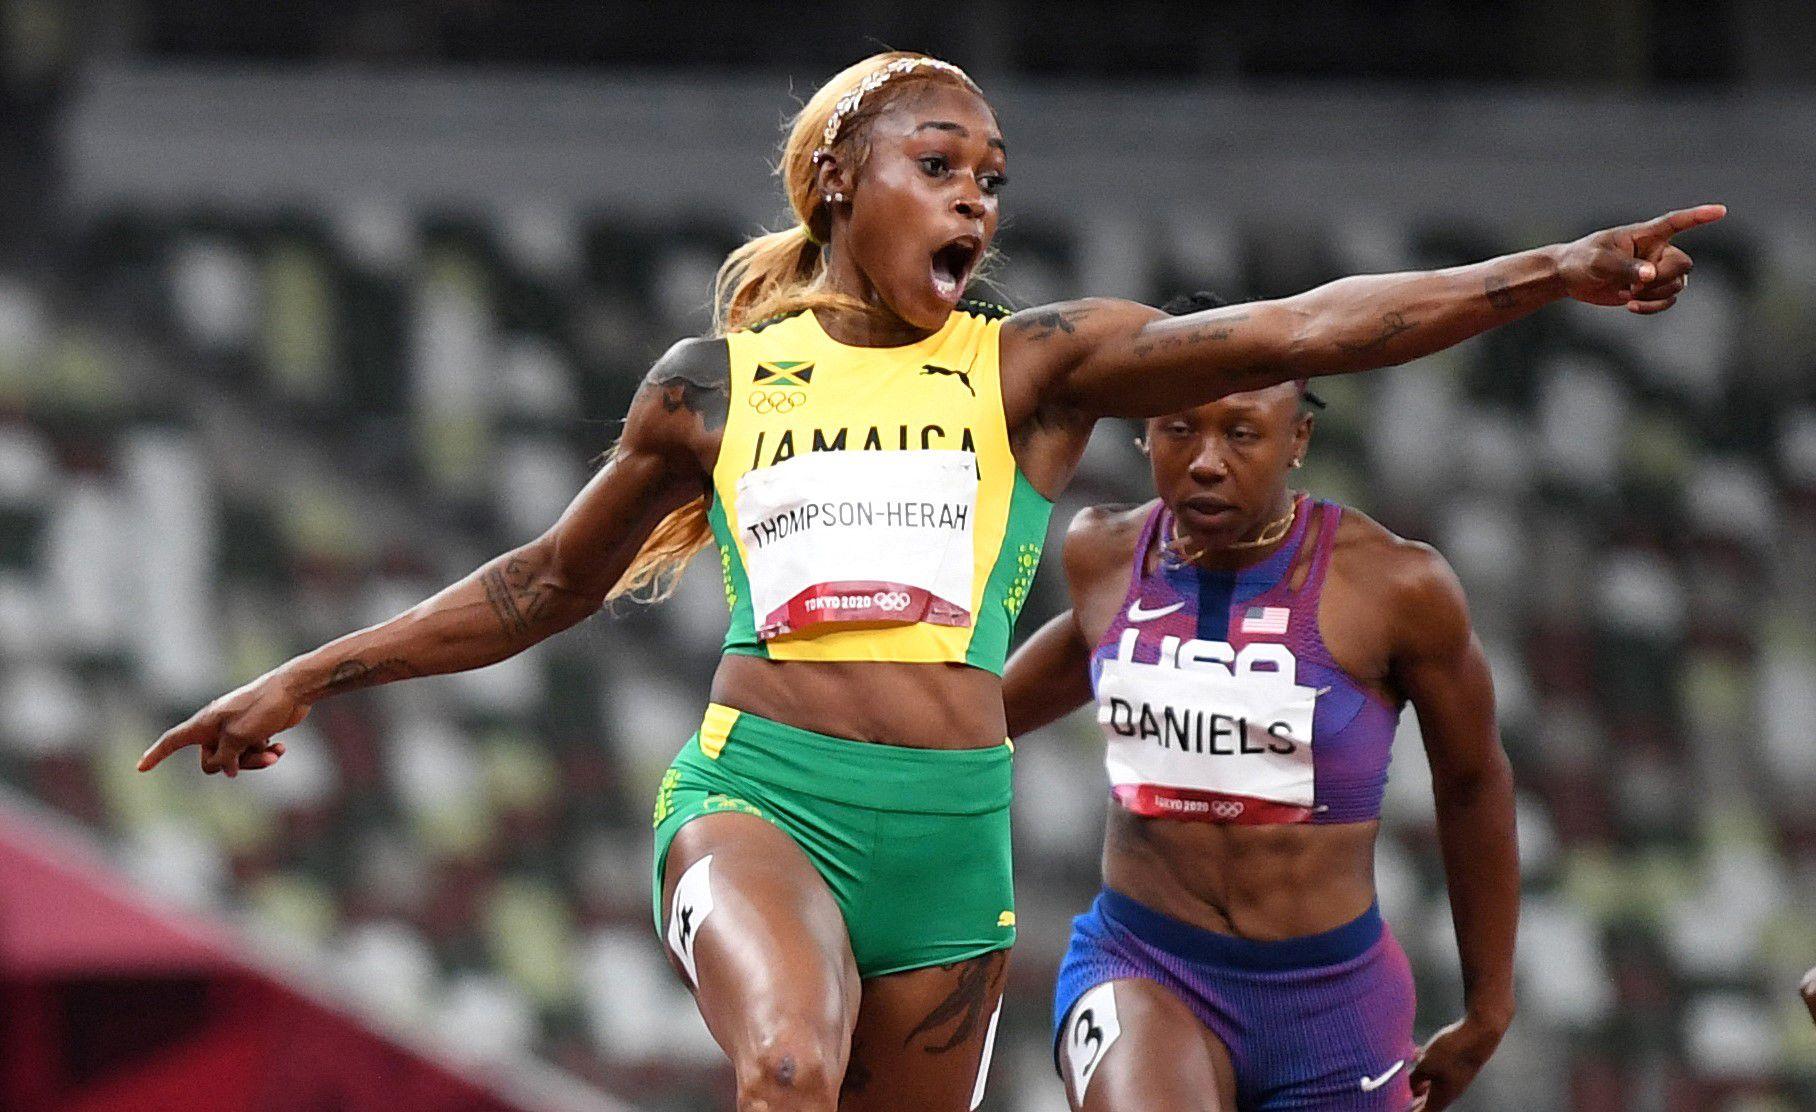 Elaine Thompson-Herah se consagró como bicampeona olímpica